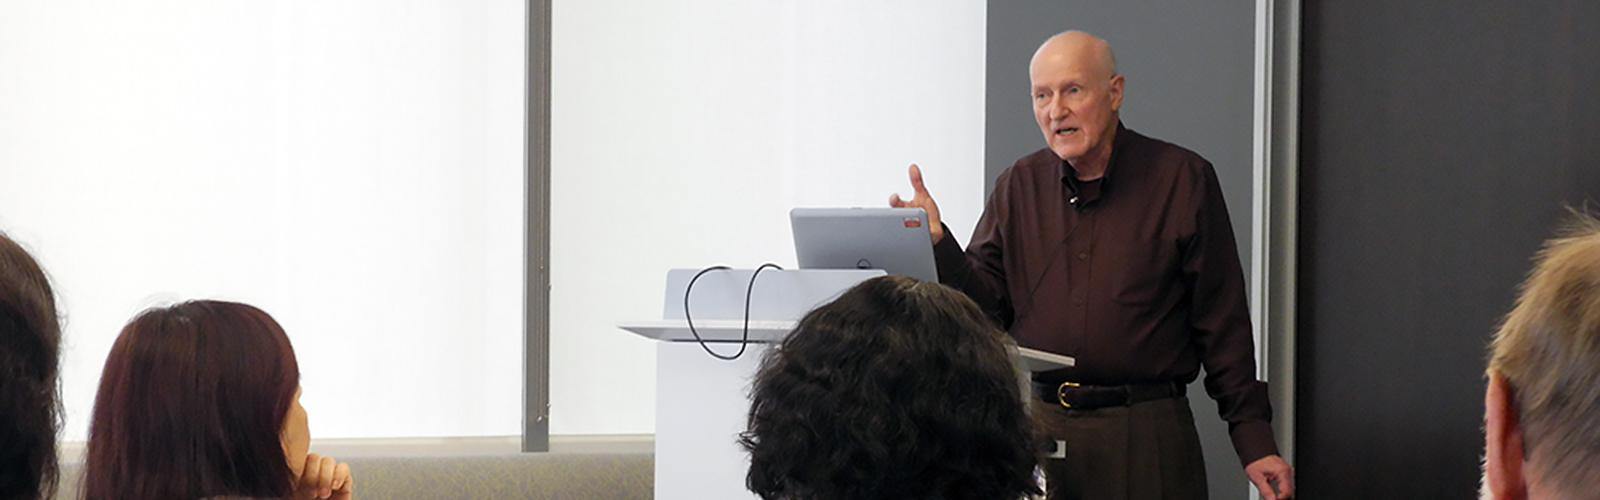 James Lubben speaks to USC audience